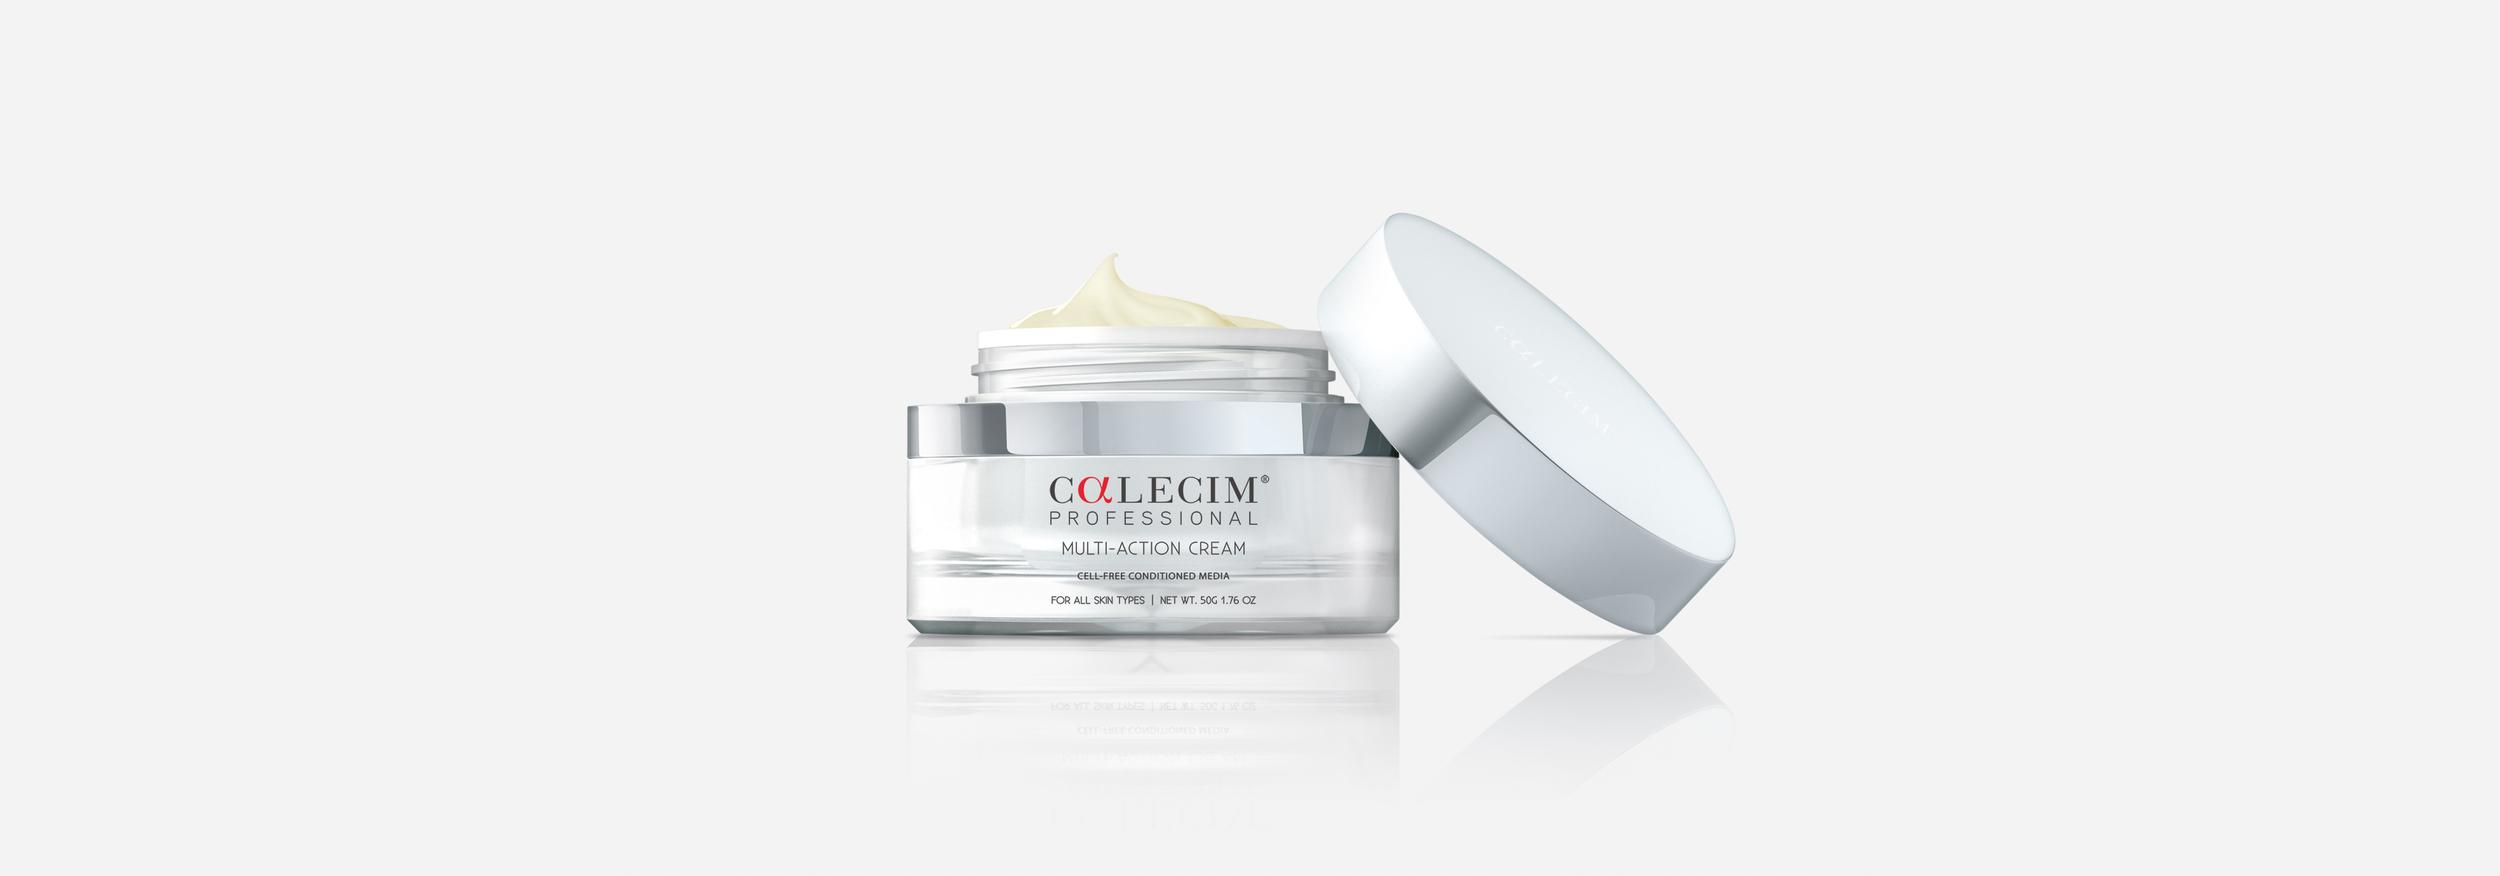 Calecim — CellResearch Corp